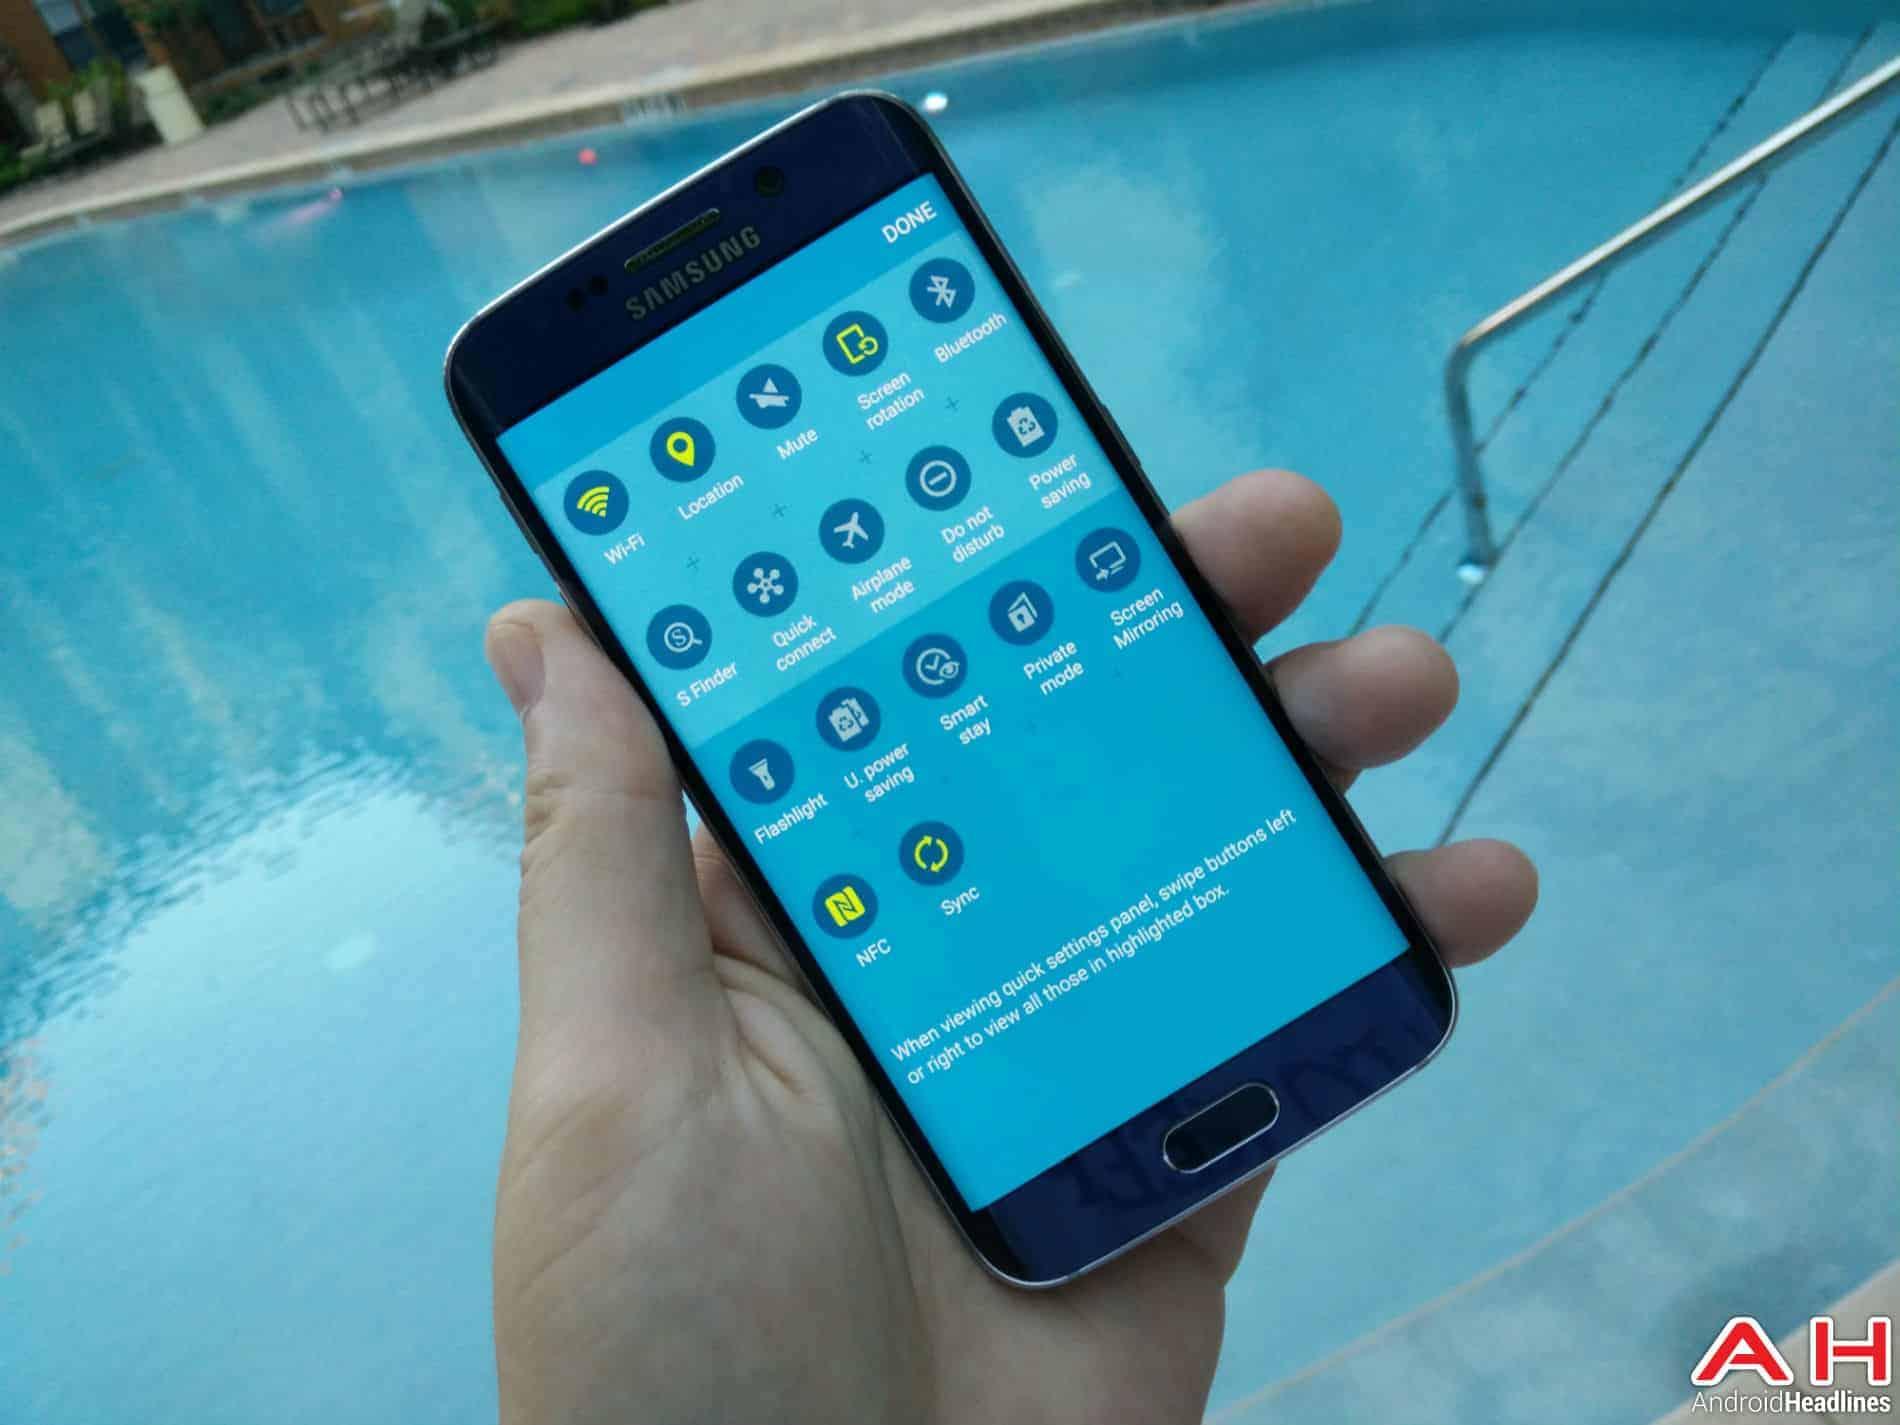 Samsung Galaxy S6 Edge AH 2